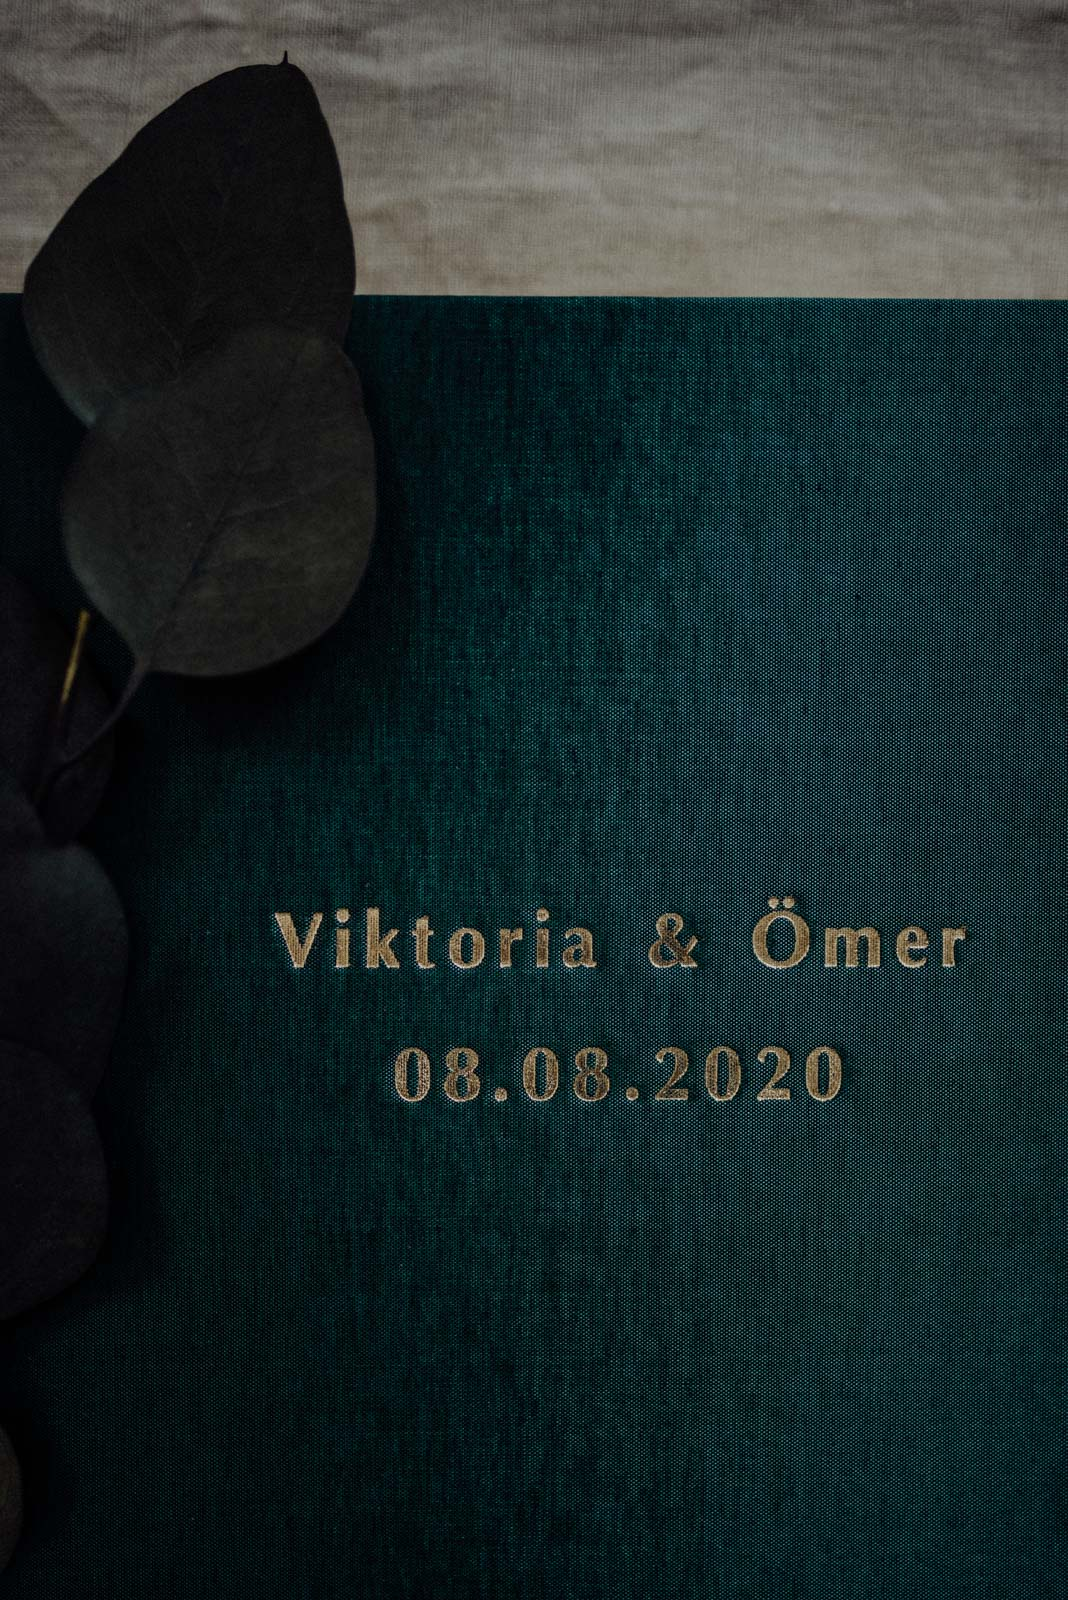 050-Fotoalbum-Fotobuch-Premium-Fotograf-Witten-Luxus